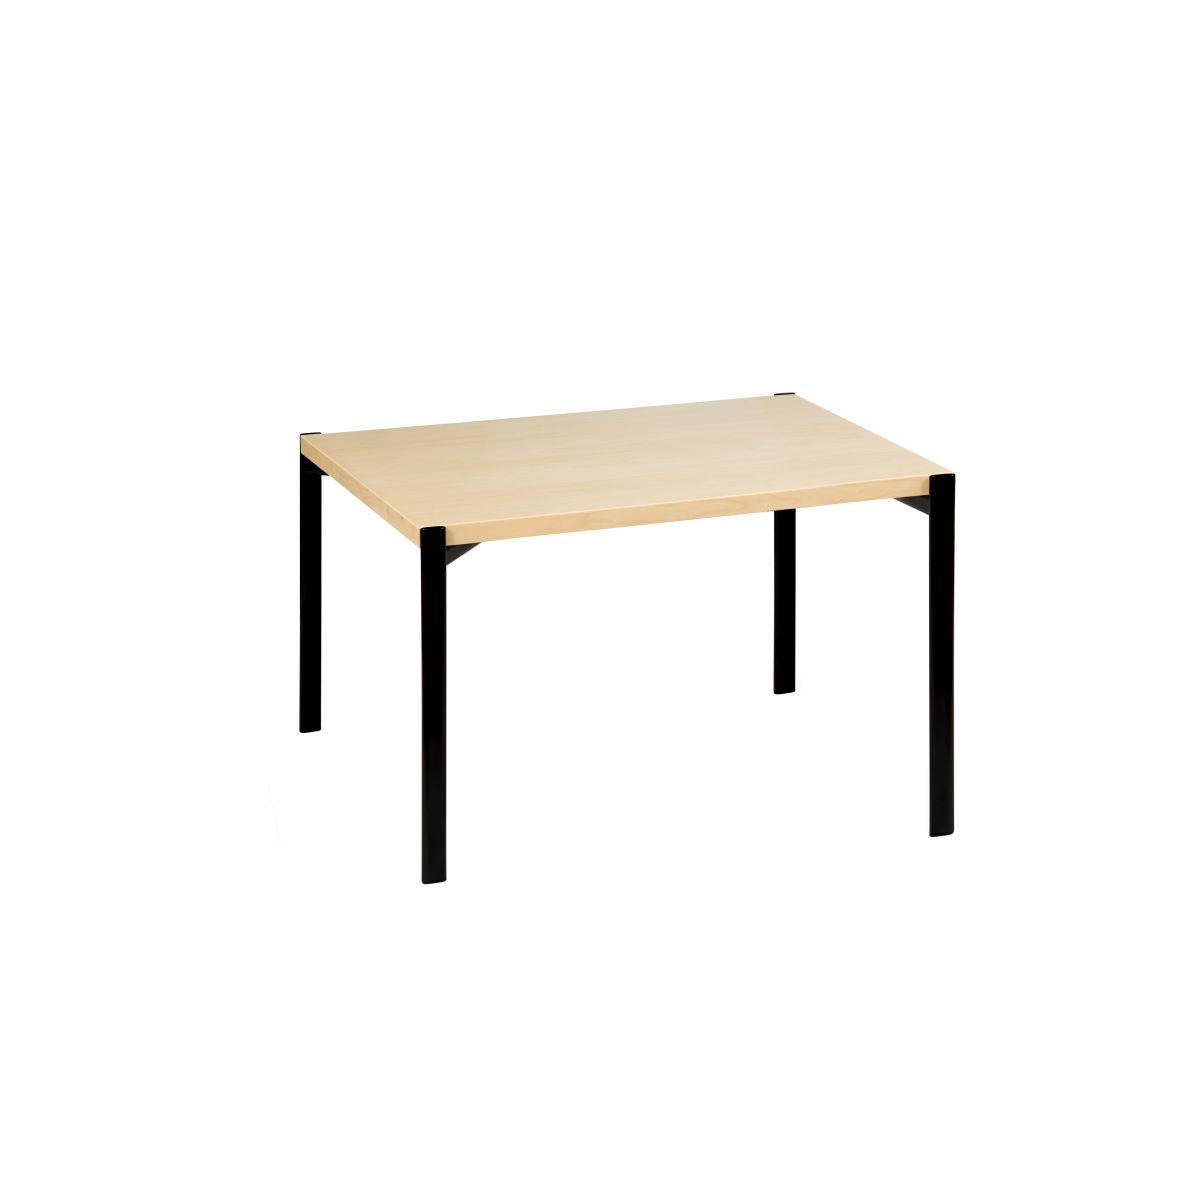 Kiki_Low_Table_birch_veneer_60-2650998